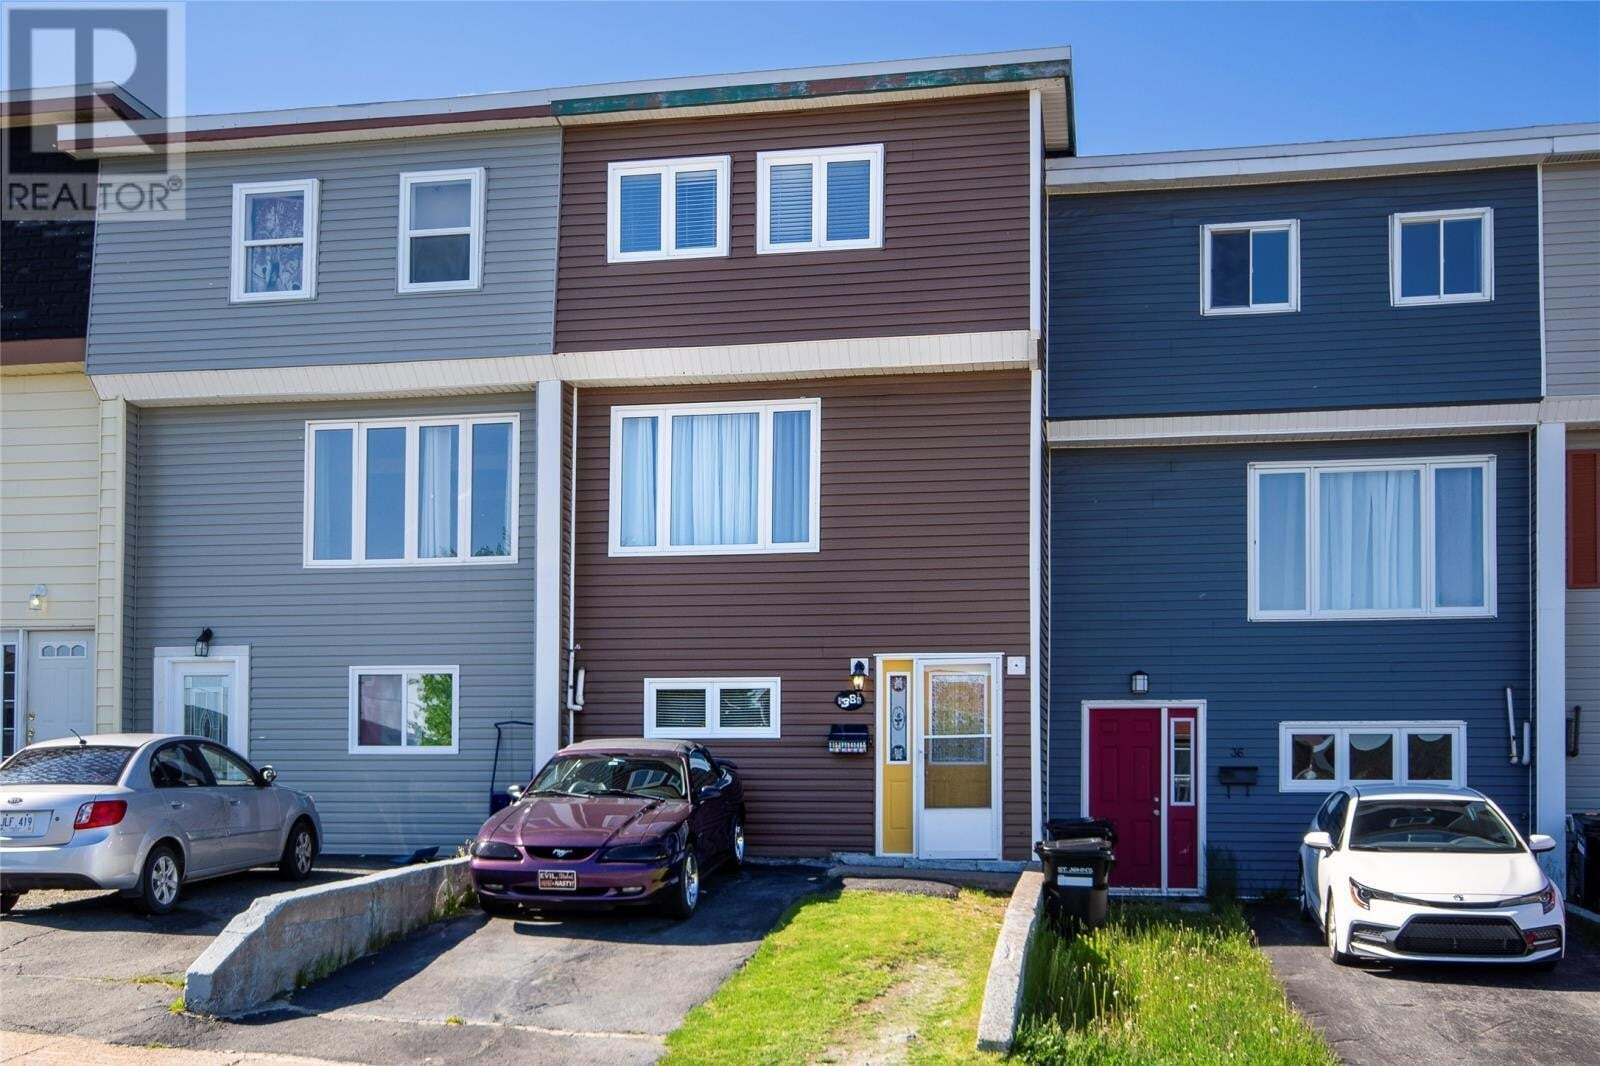 House for sale at 38 Eastaff St St. John's Newfoundland - MLS: 1216415